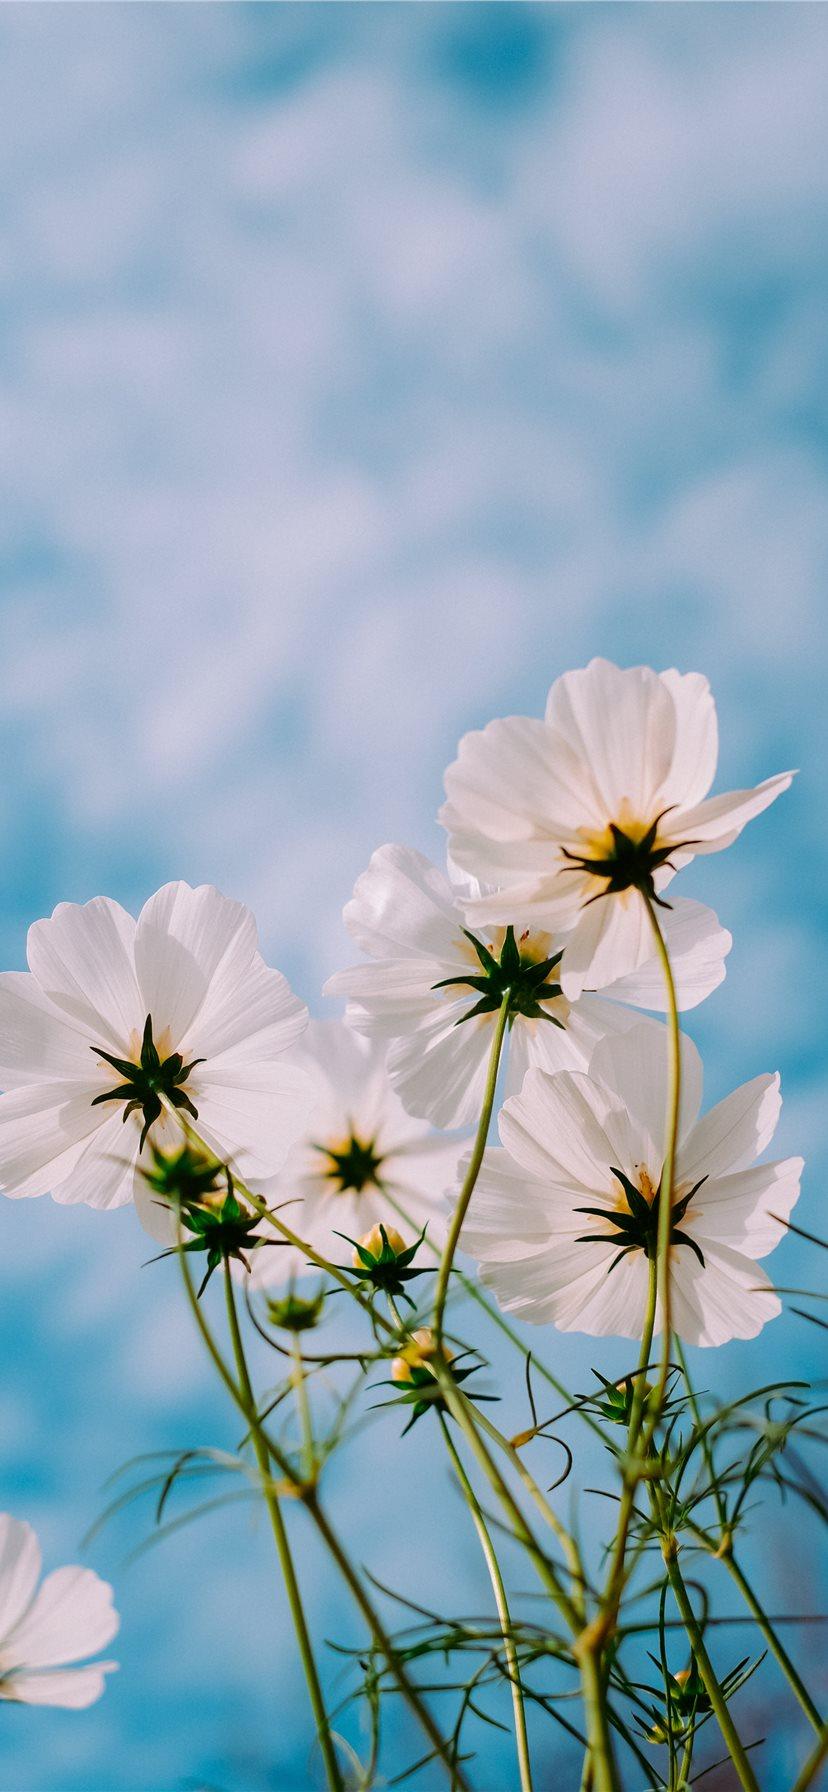 Best Flower Iphone 11 Wallpapers Hd 2020 Ilikewallpaper